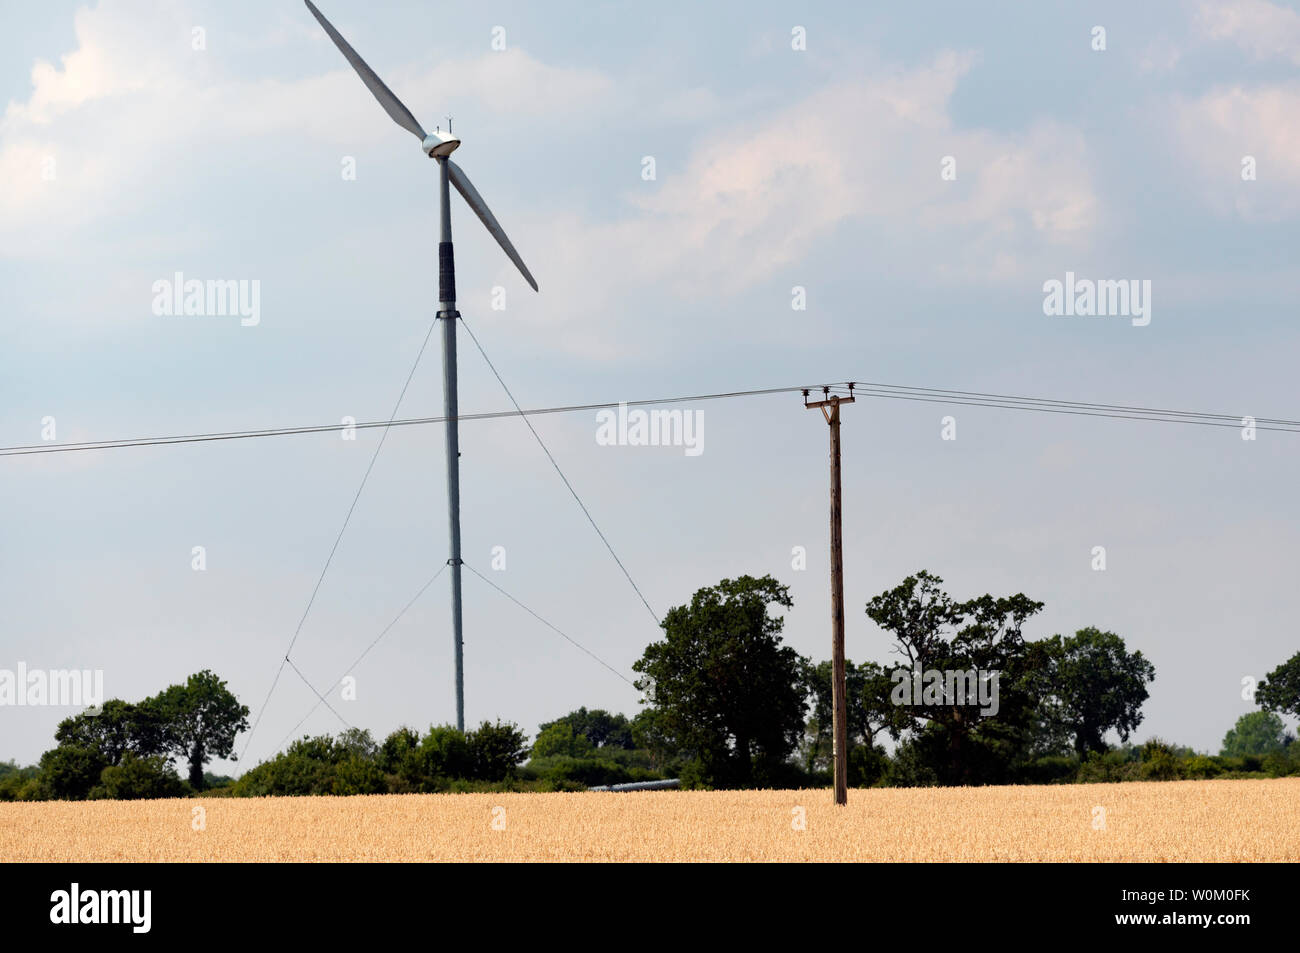 Micro Wind Turbine Stock Photos & Micro Wind Turbine Stock Images